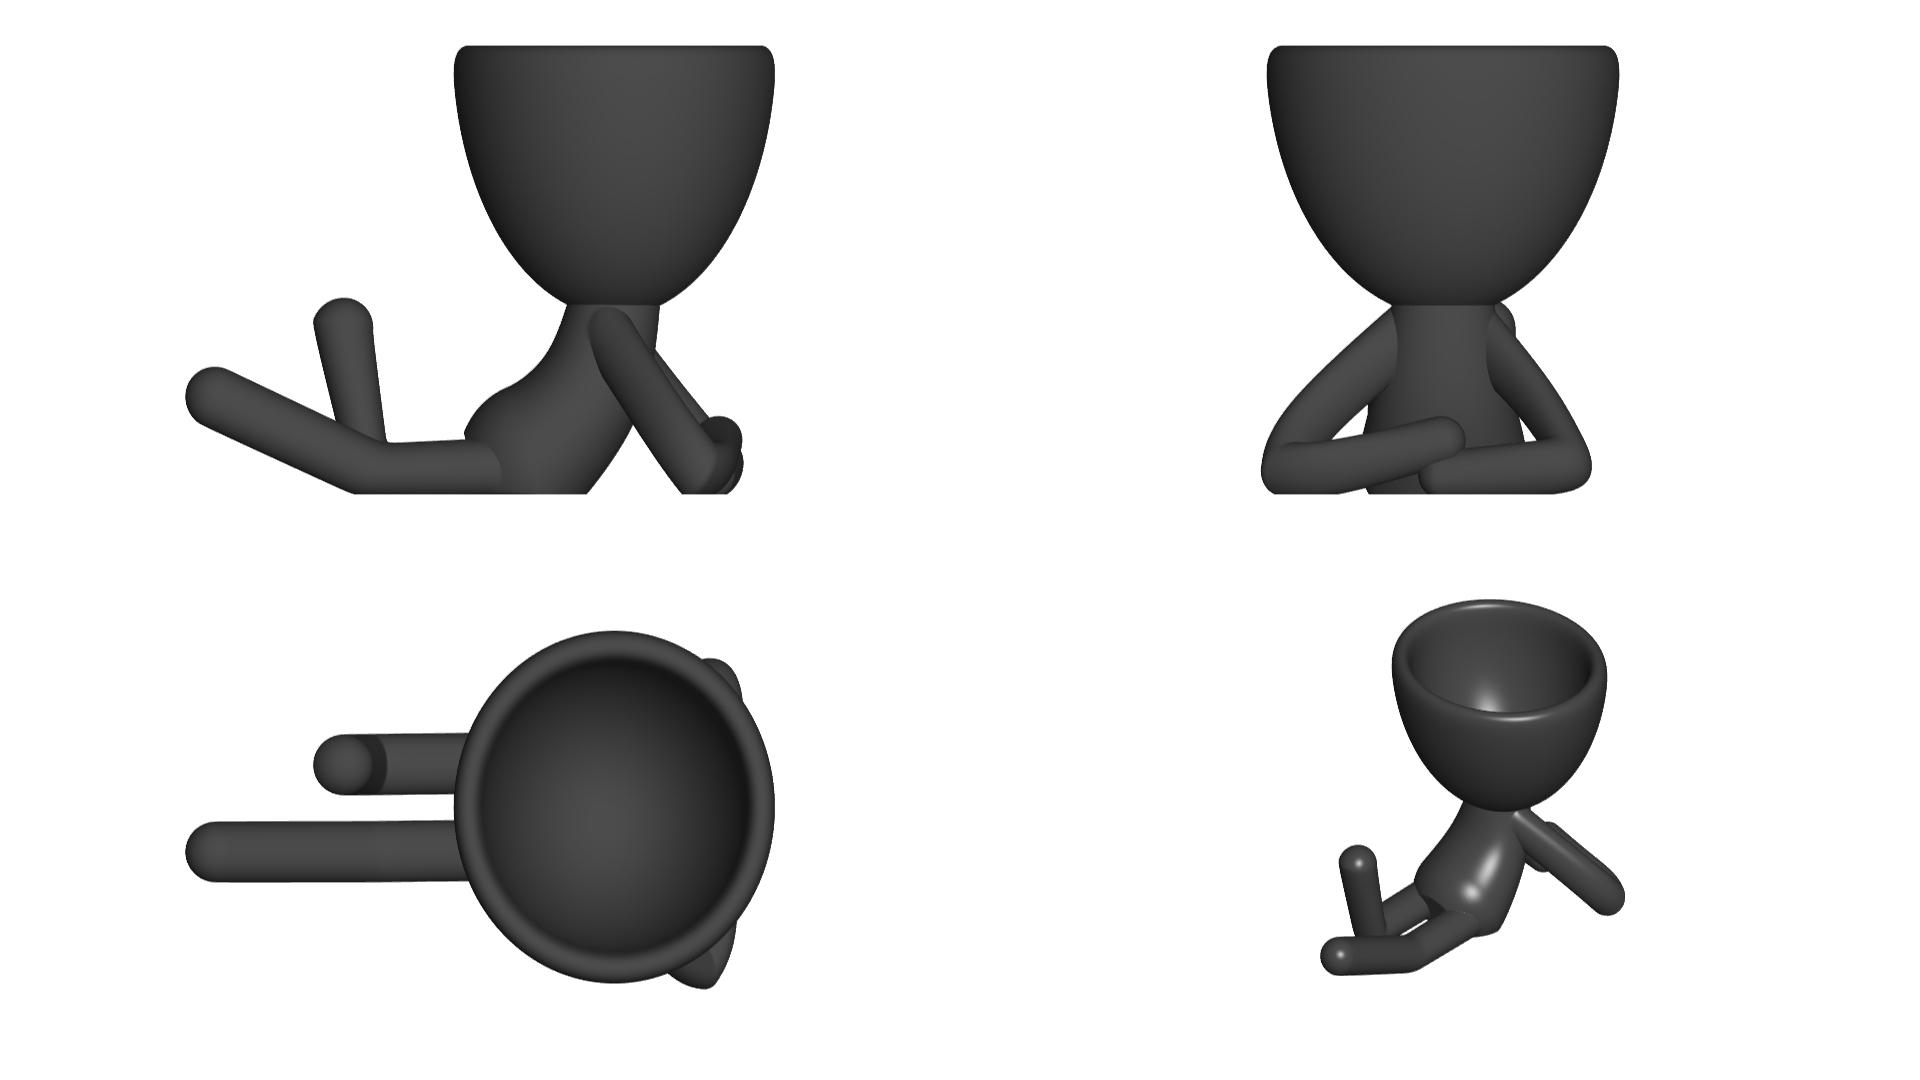 Vaso_02_Negro_2.jpg Download free STL file JARRÓN MACETA ROBERT 02 - VASE FLOWERPOT ROBERT 02 • 3D print model, PRODUSTL56